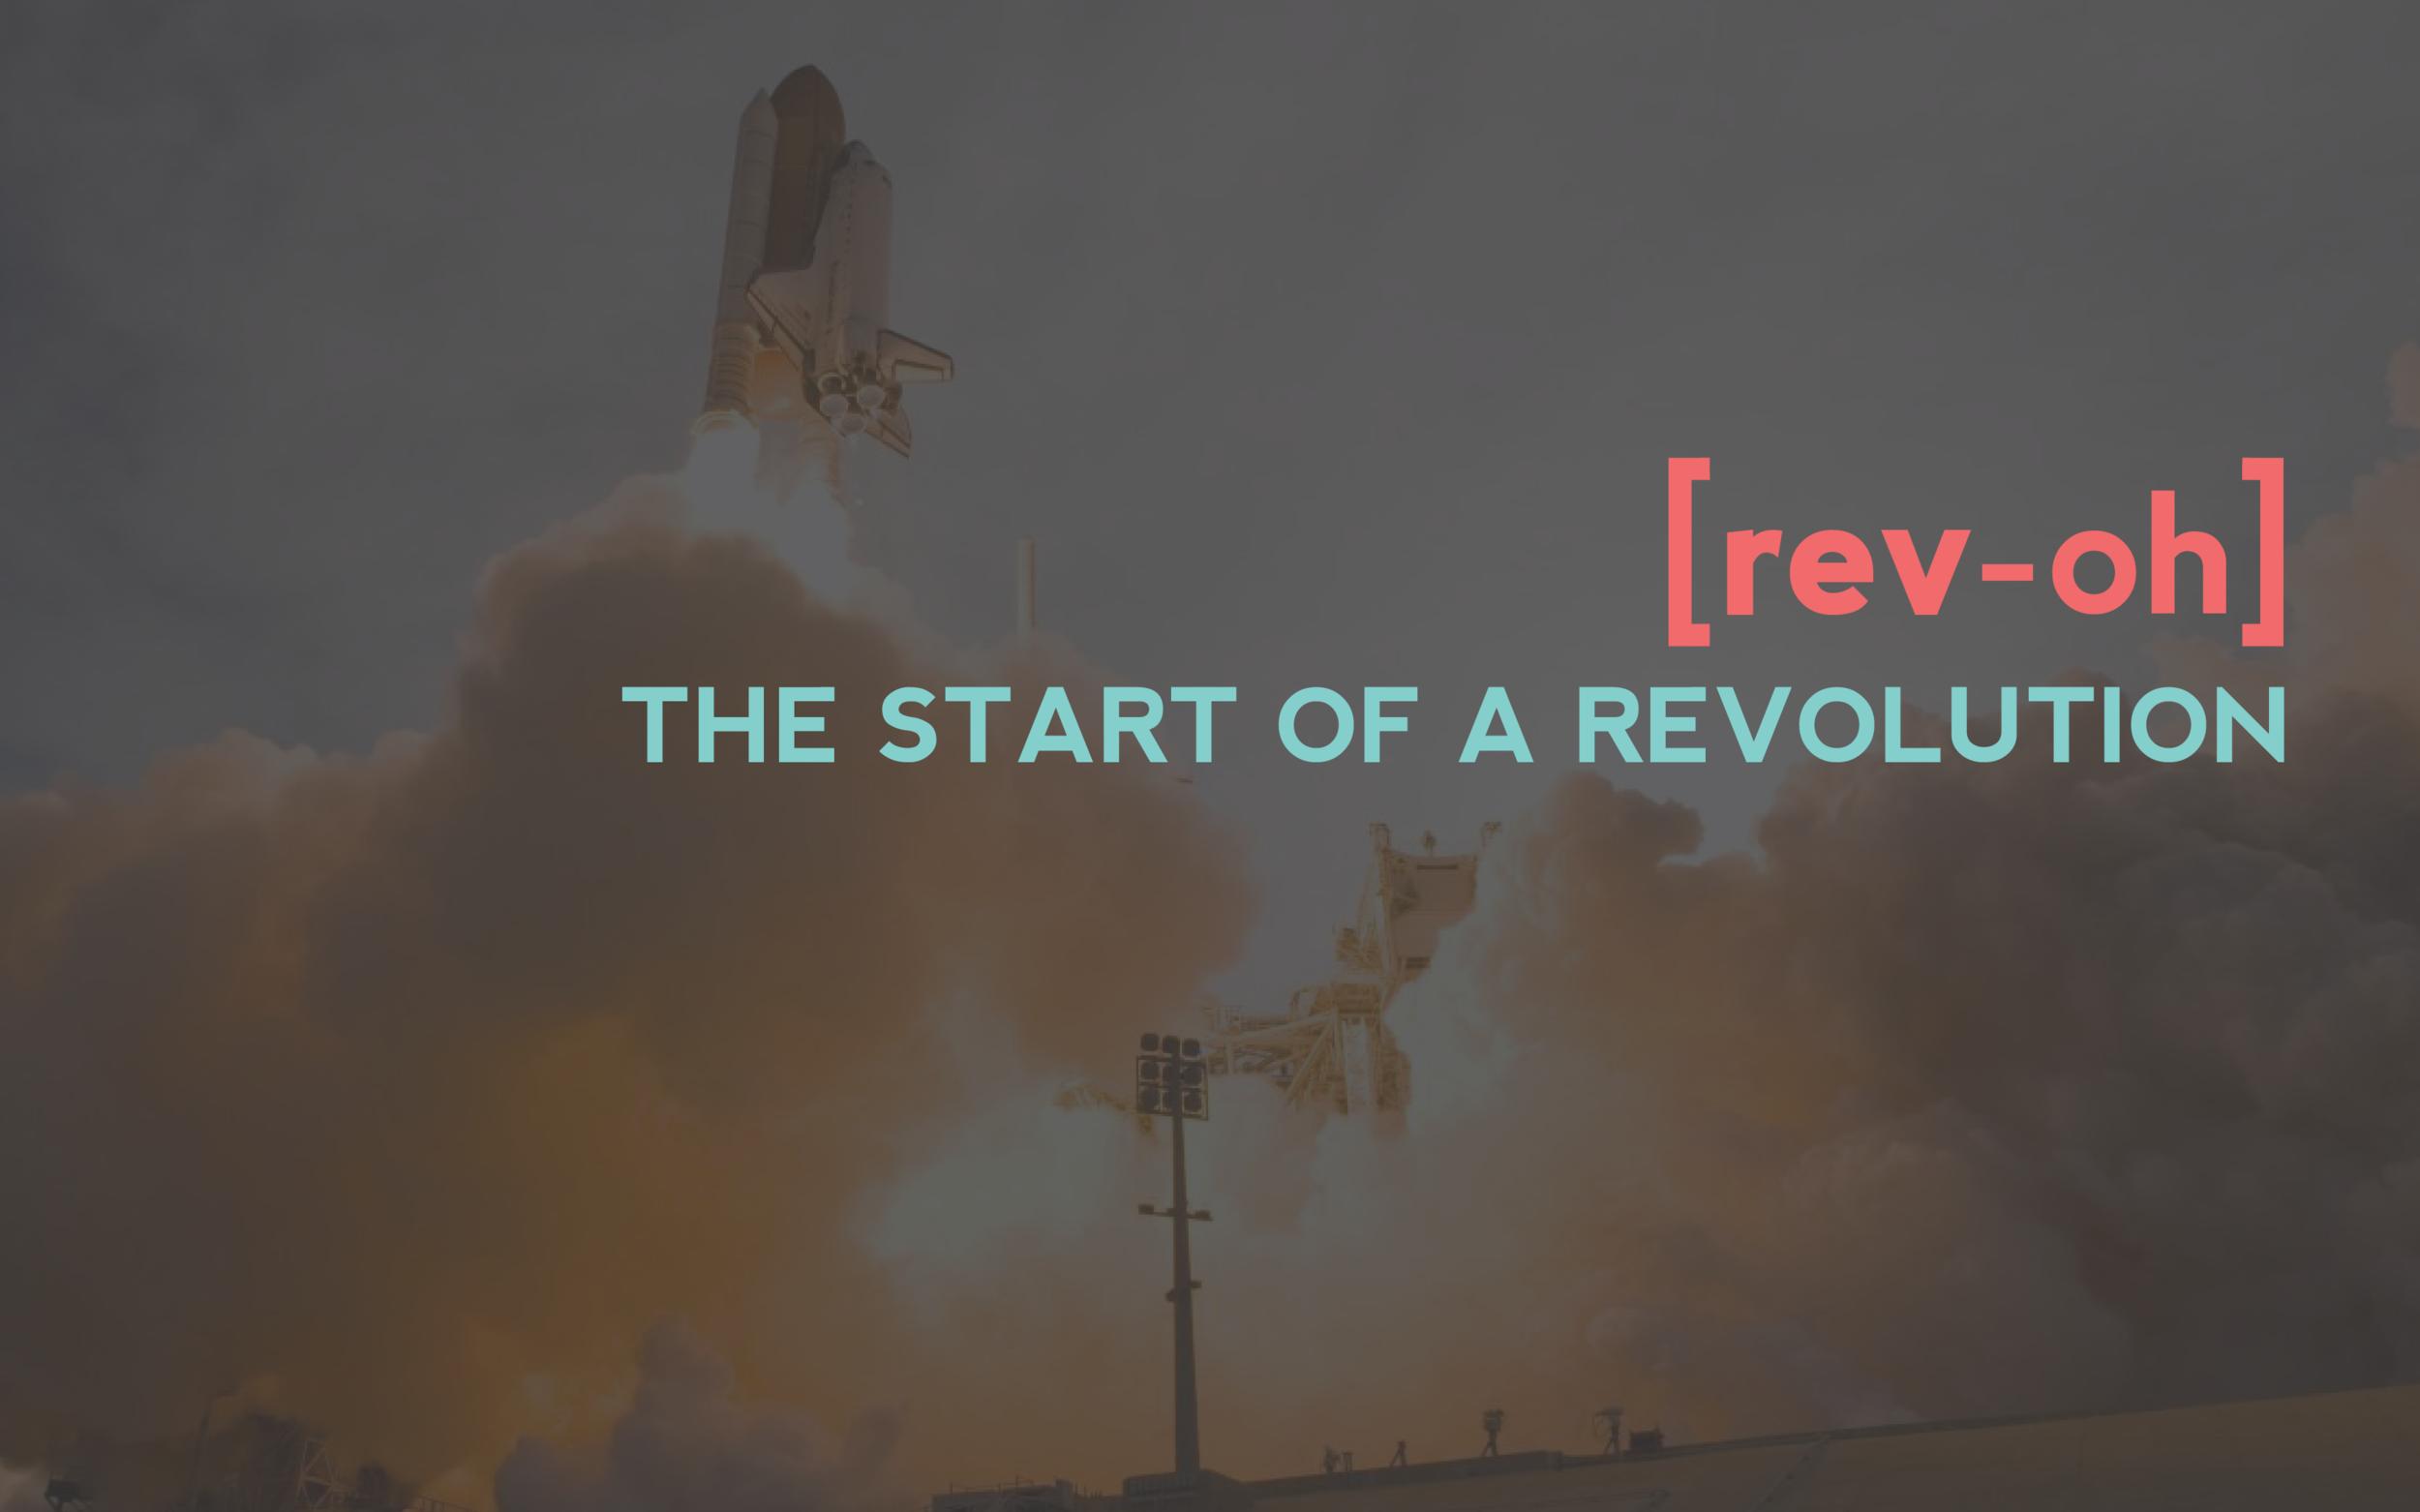 revoheader-01.png